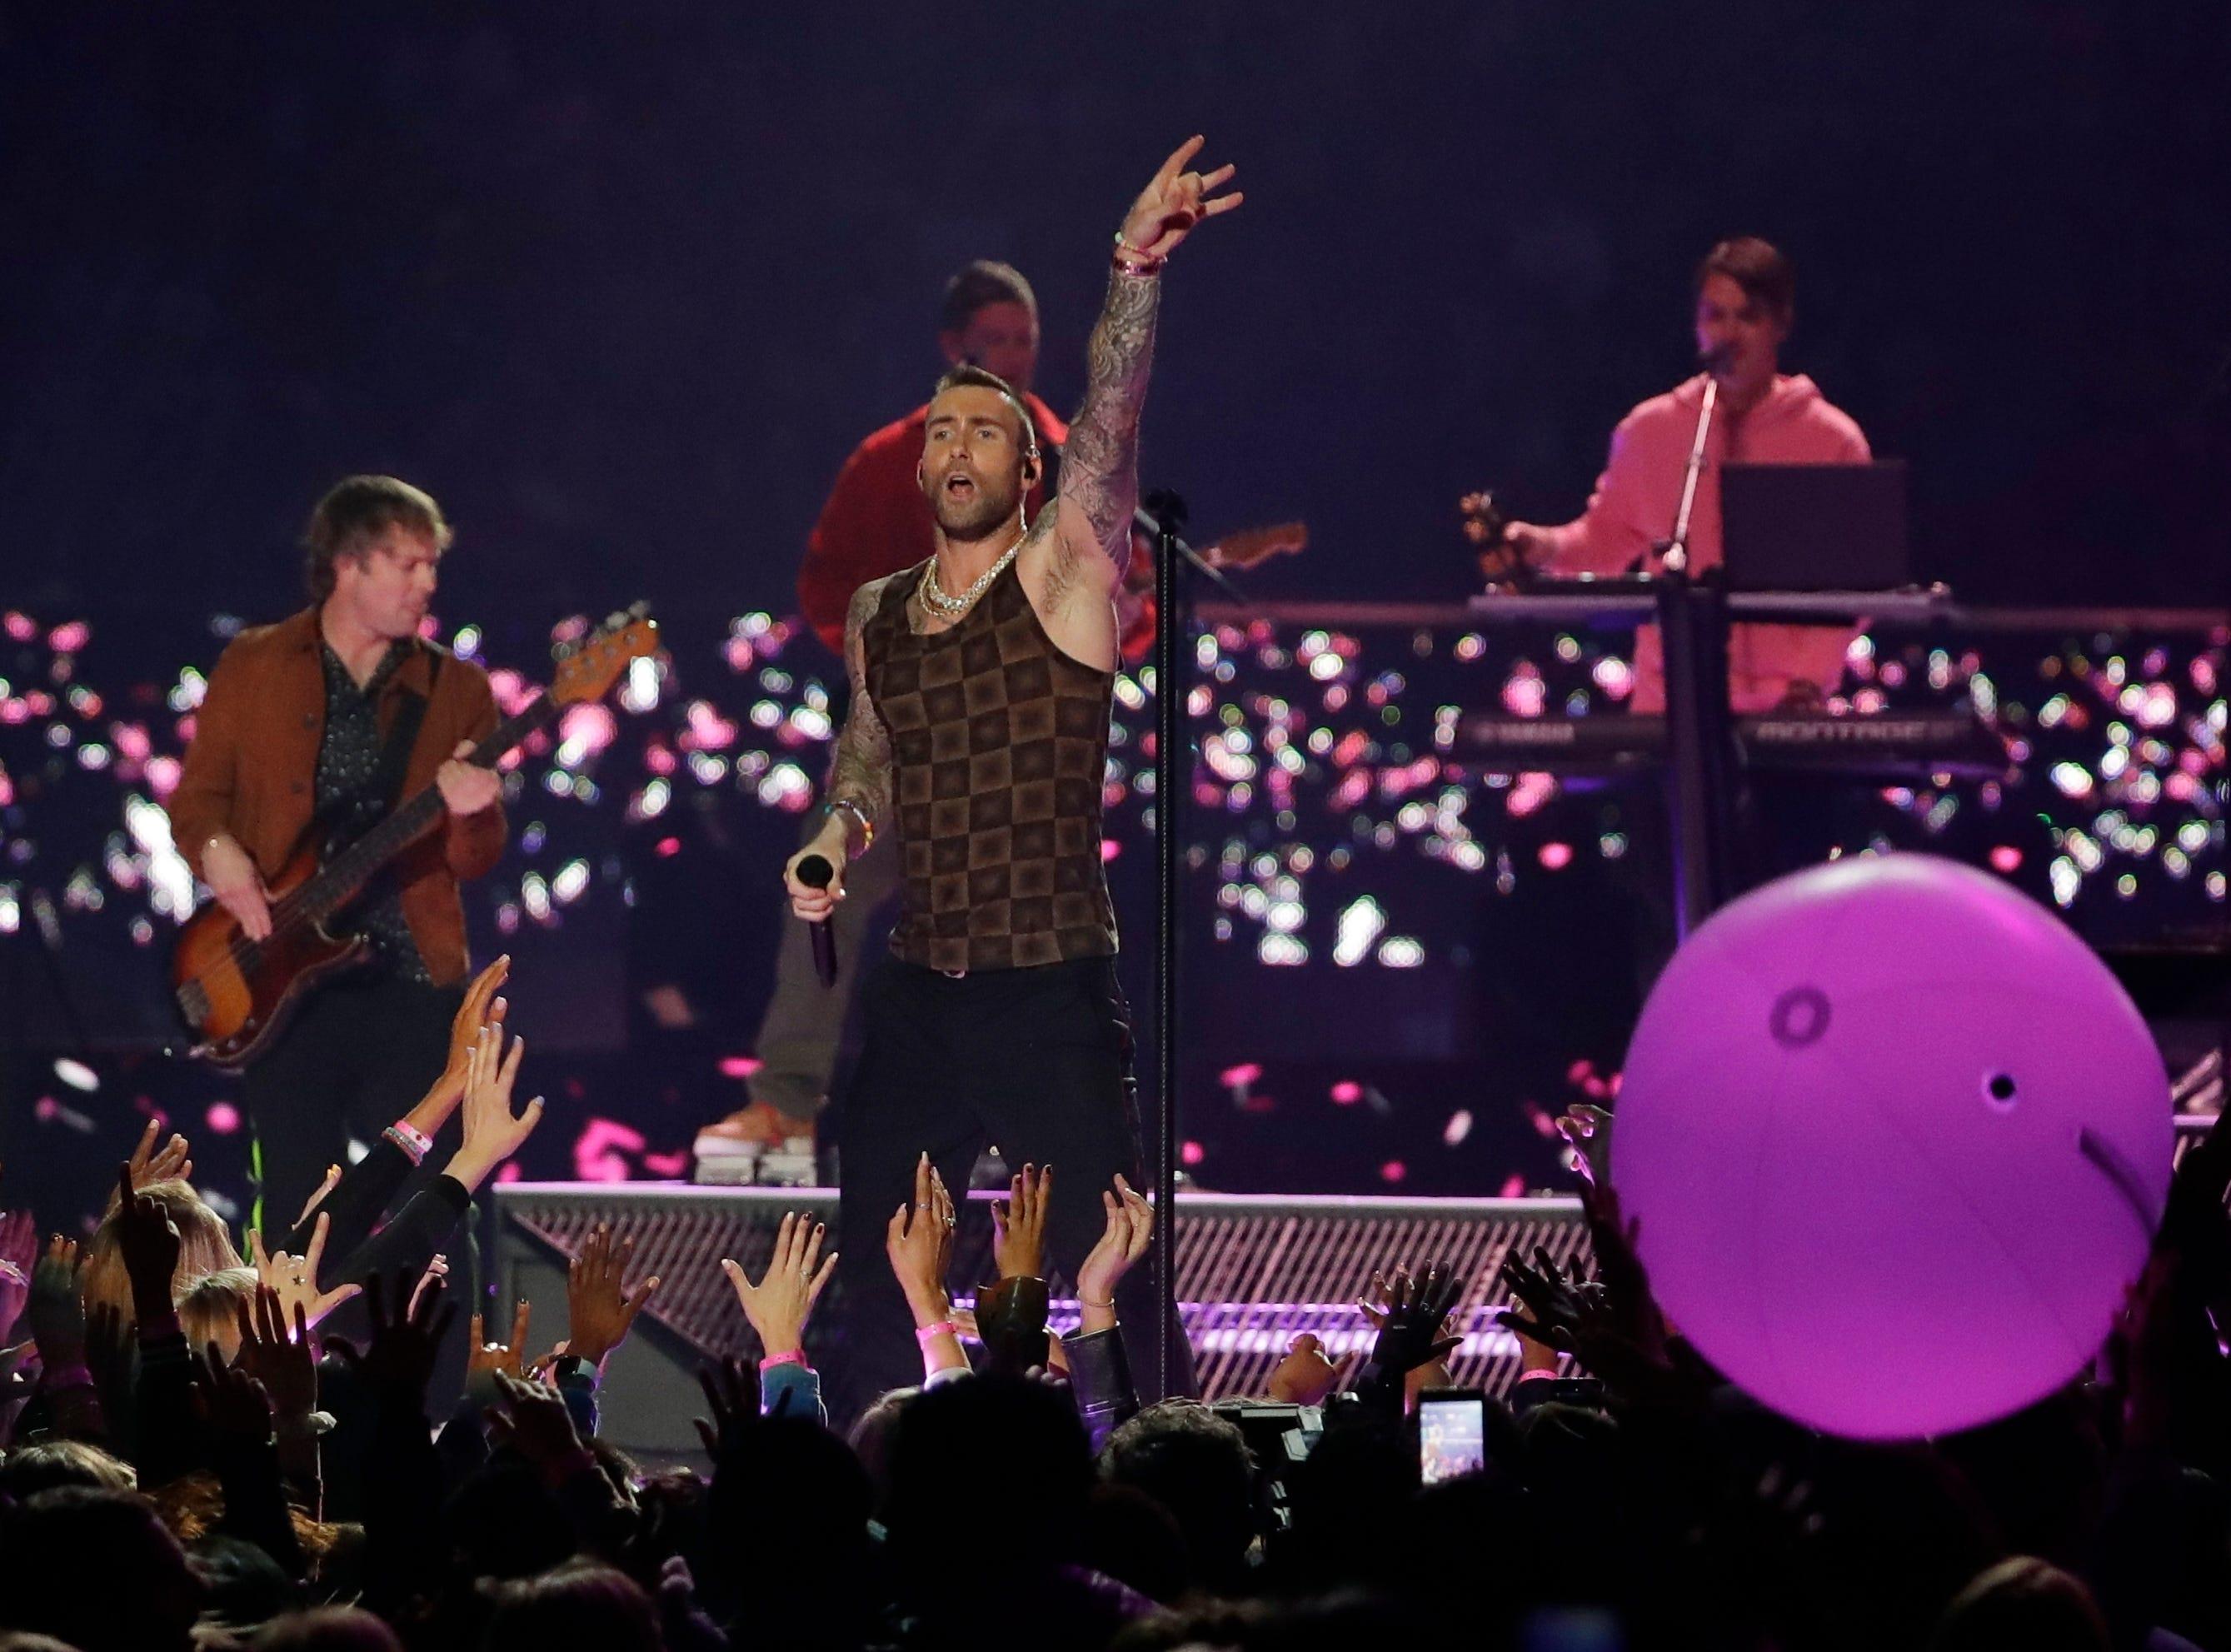 Adam Levine of Maroon 5 performs during halftime.